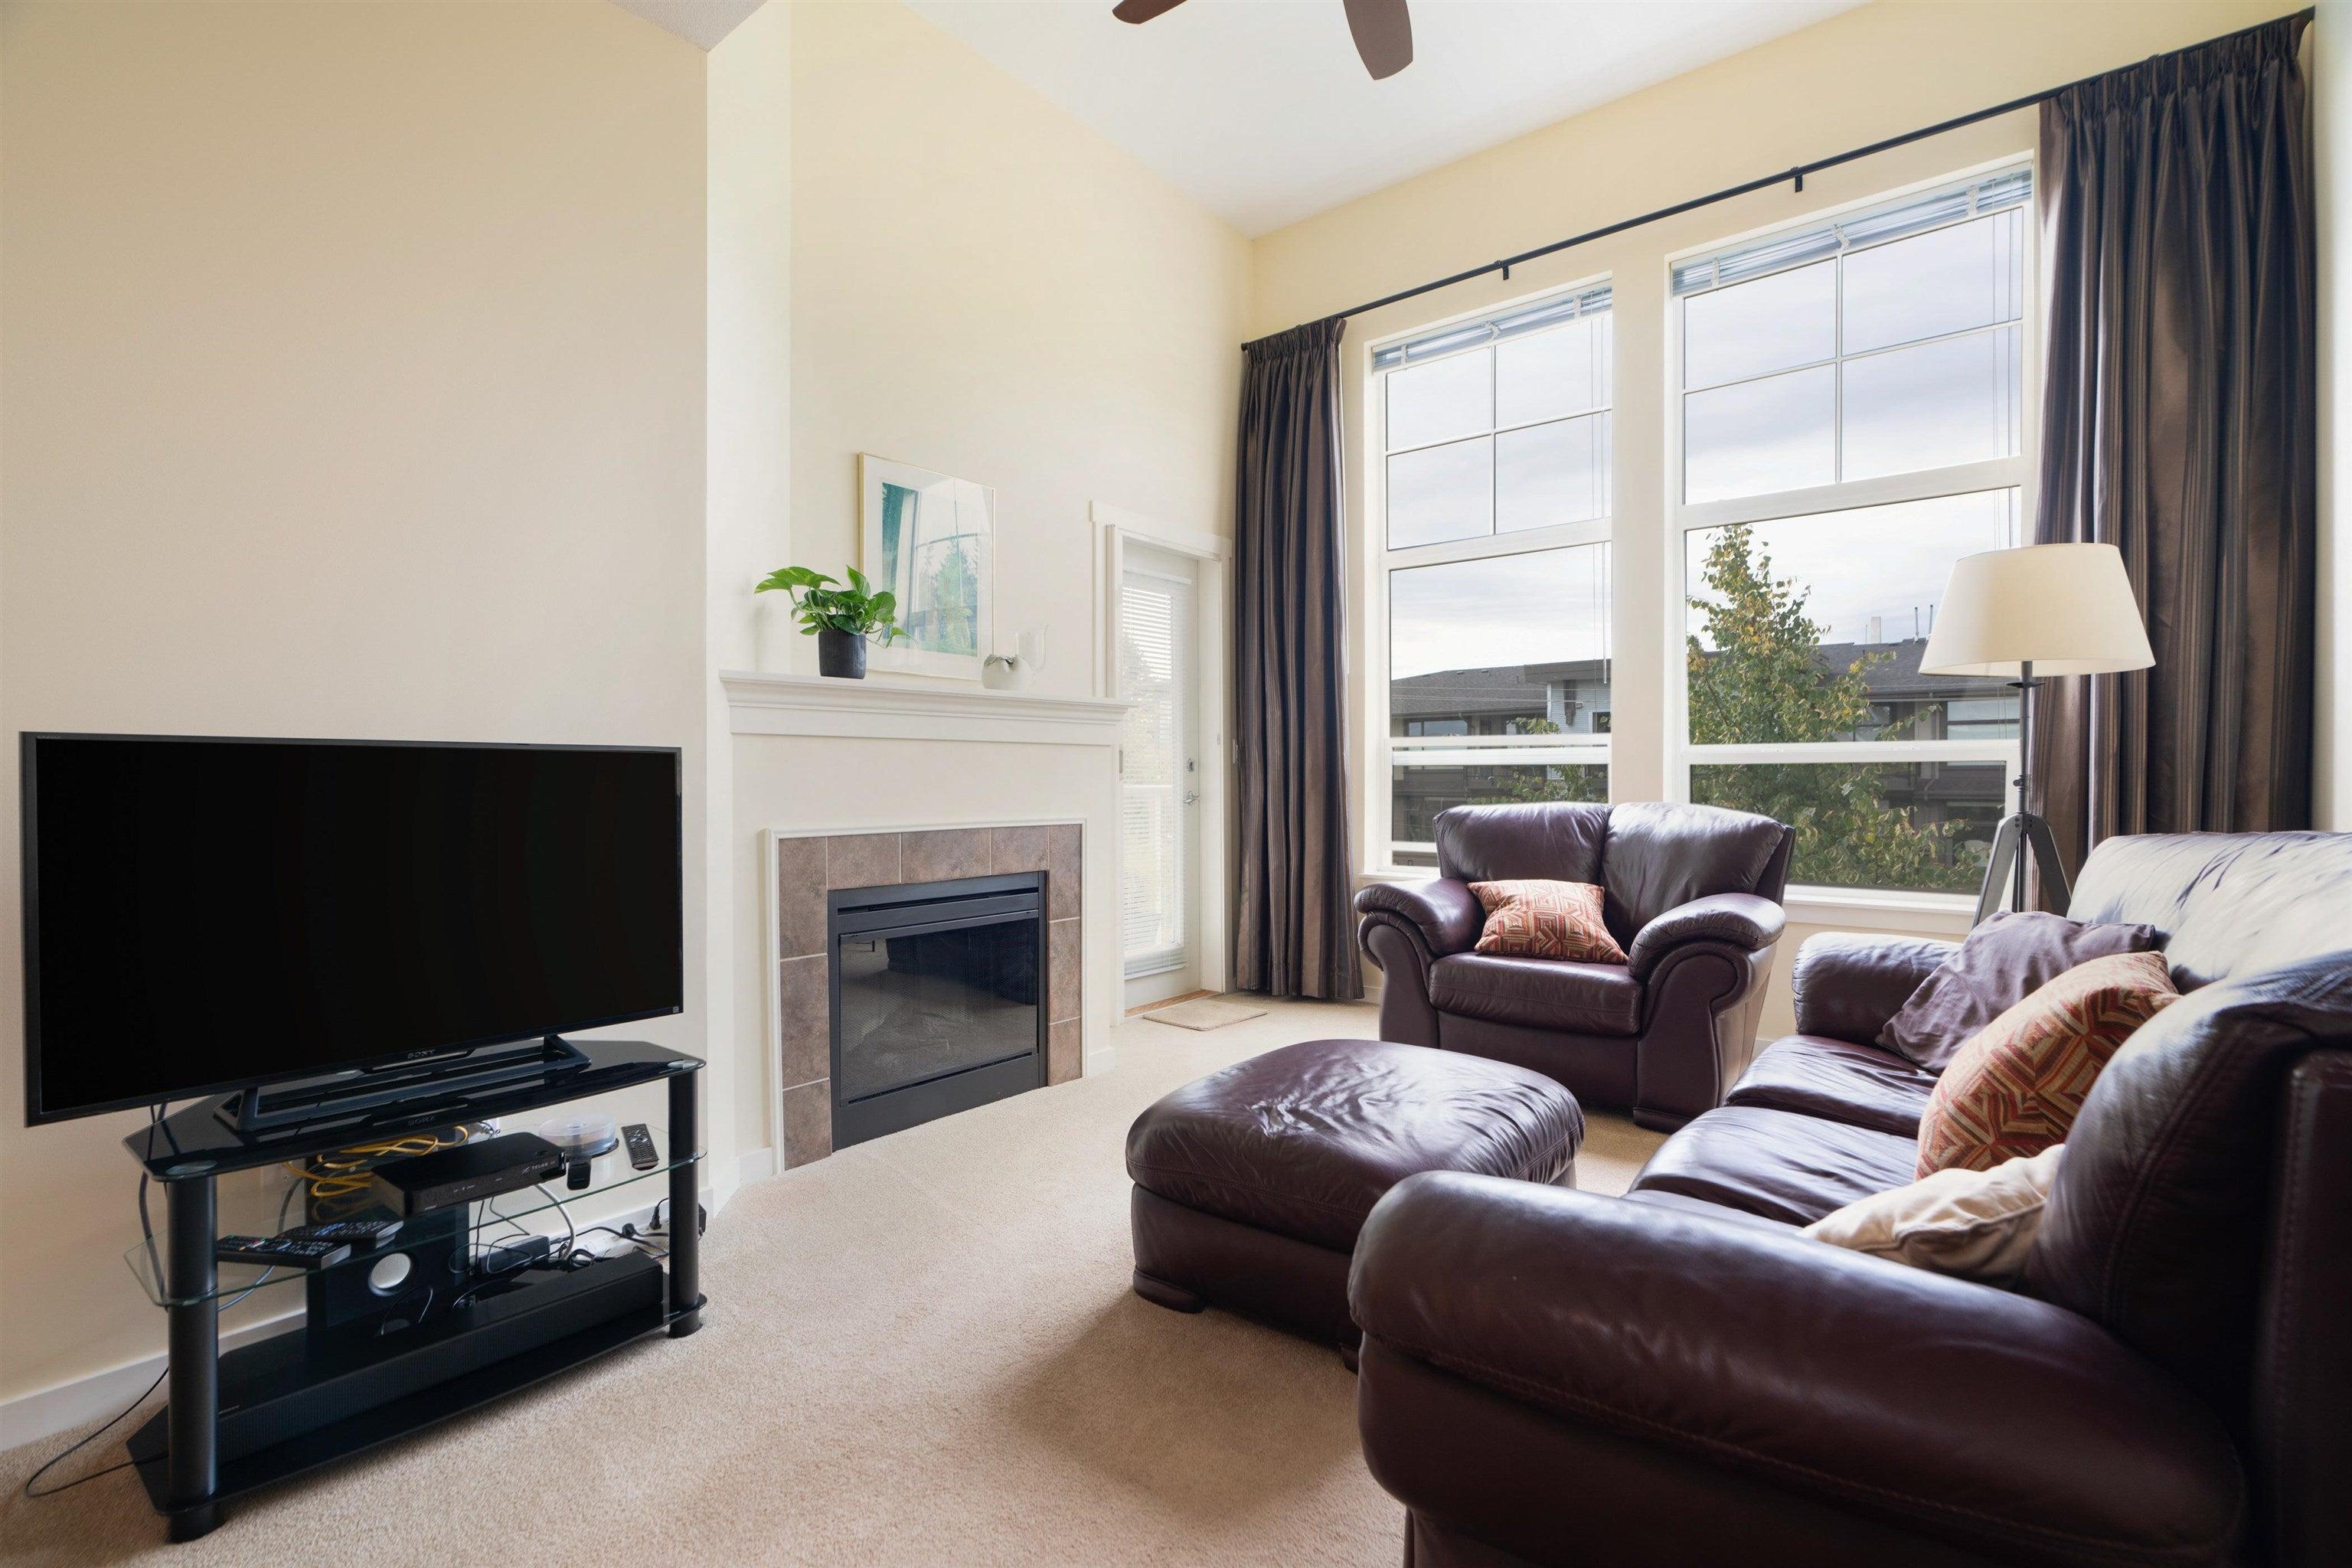 403 15299 17A AVENUE - King George Corridor Apartment/Condo for sale, 2 Bedrooms (R2618833)